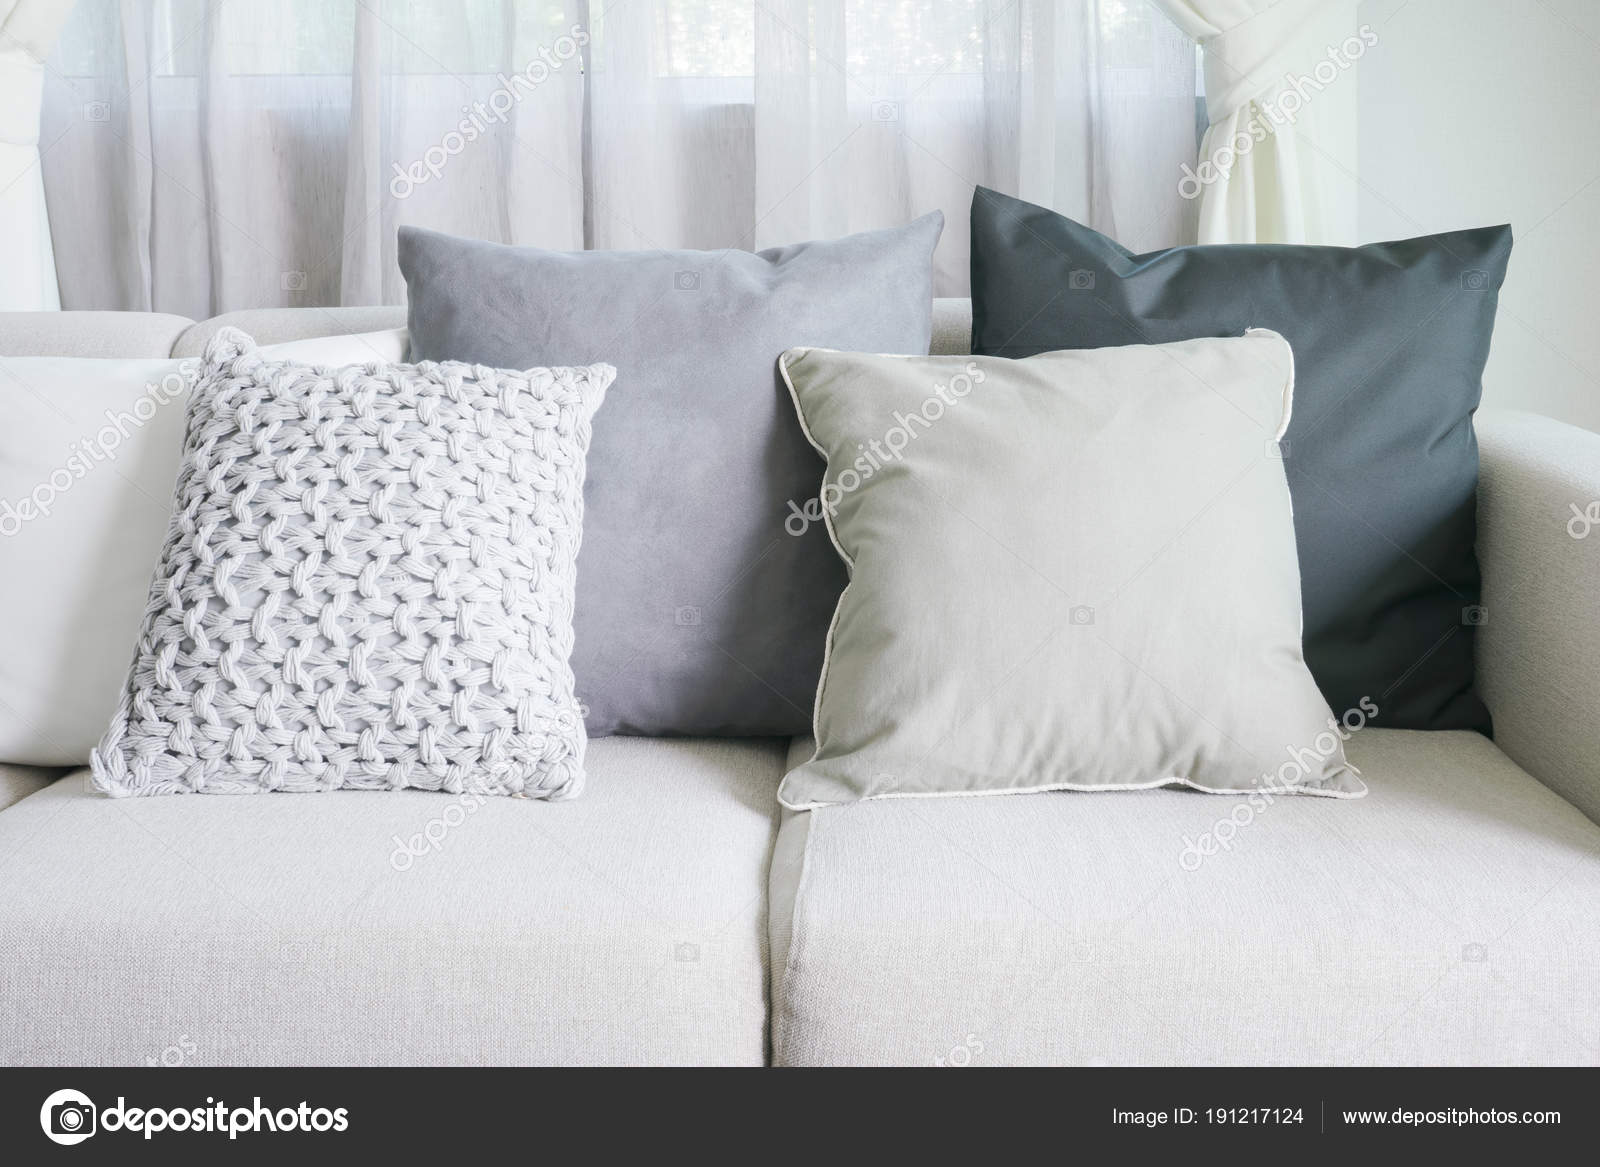 https://st3.depositphotos.com/6200870/19121/i/1600/depositphotos_191217124-stock-photo-light-gray-sofa-set-with.jpg